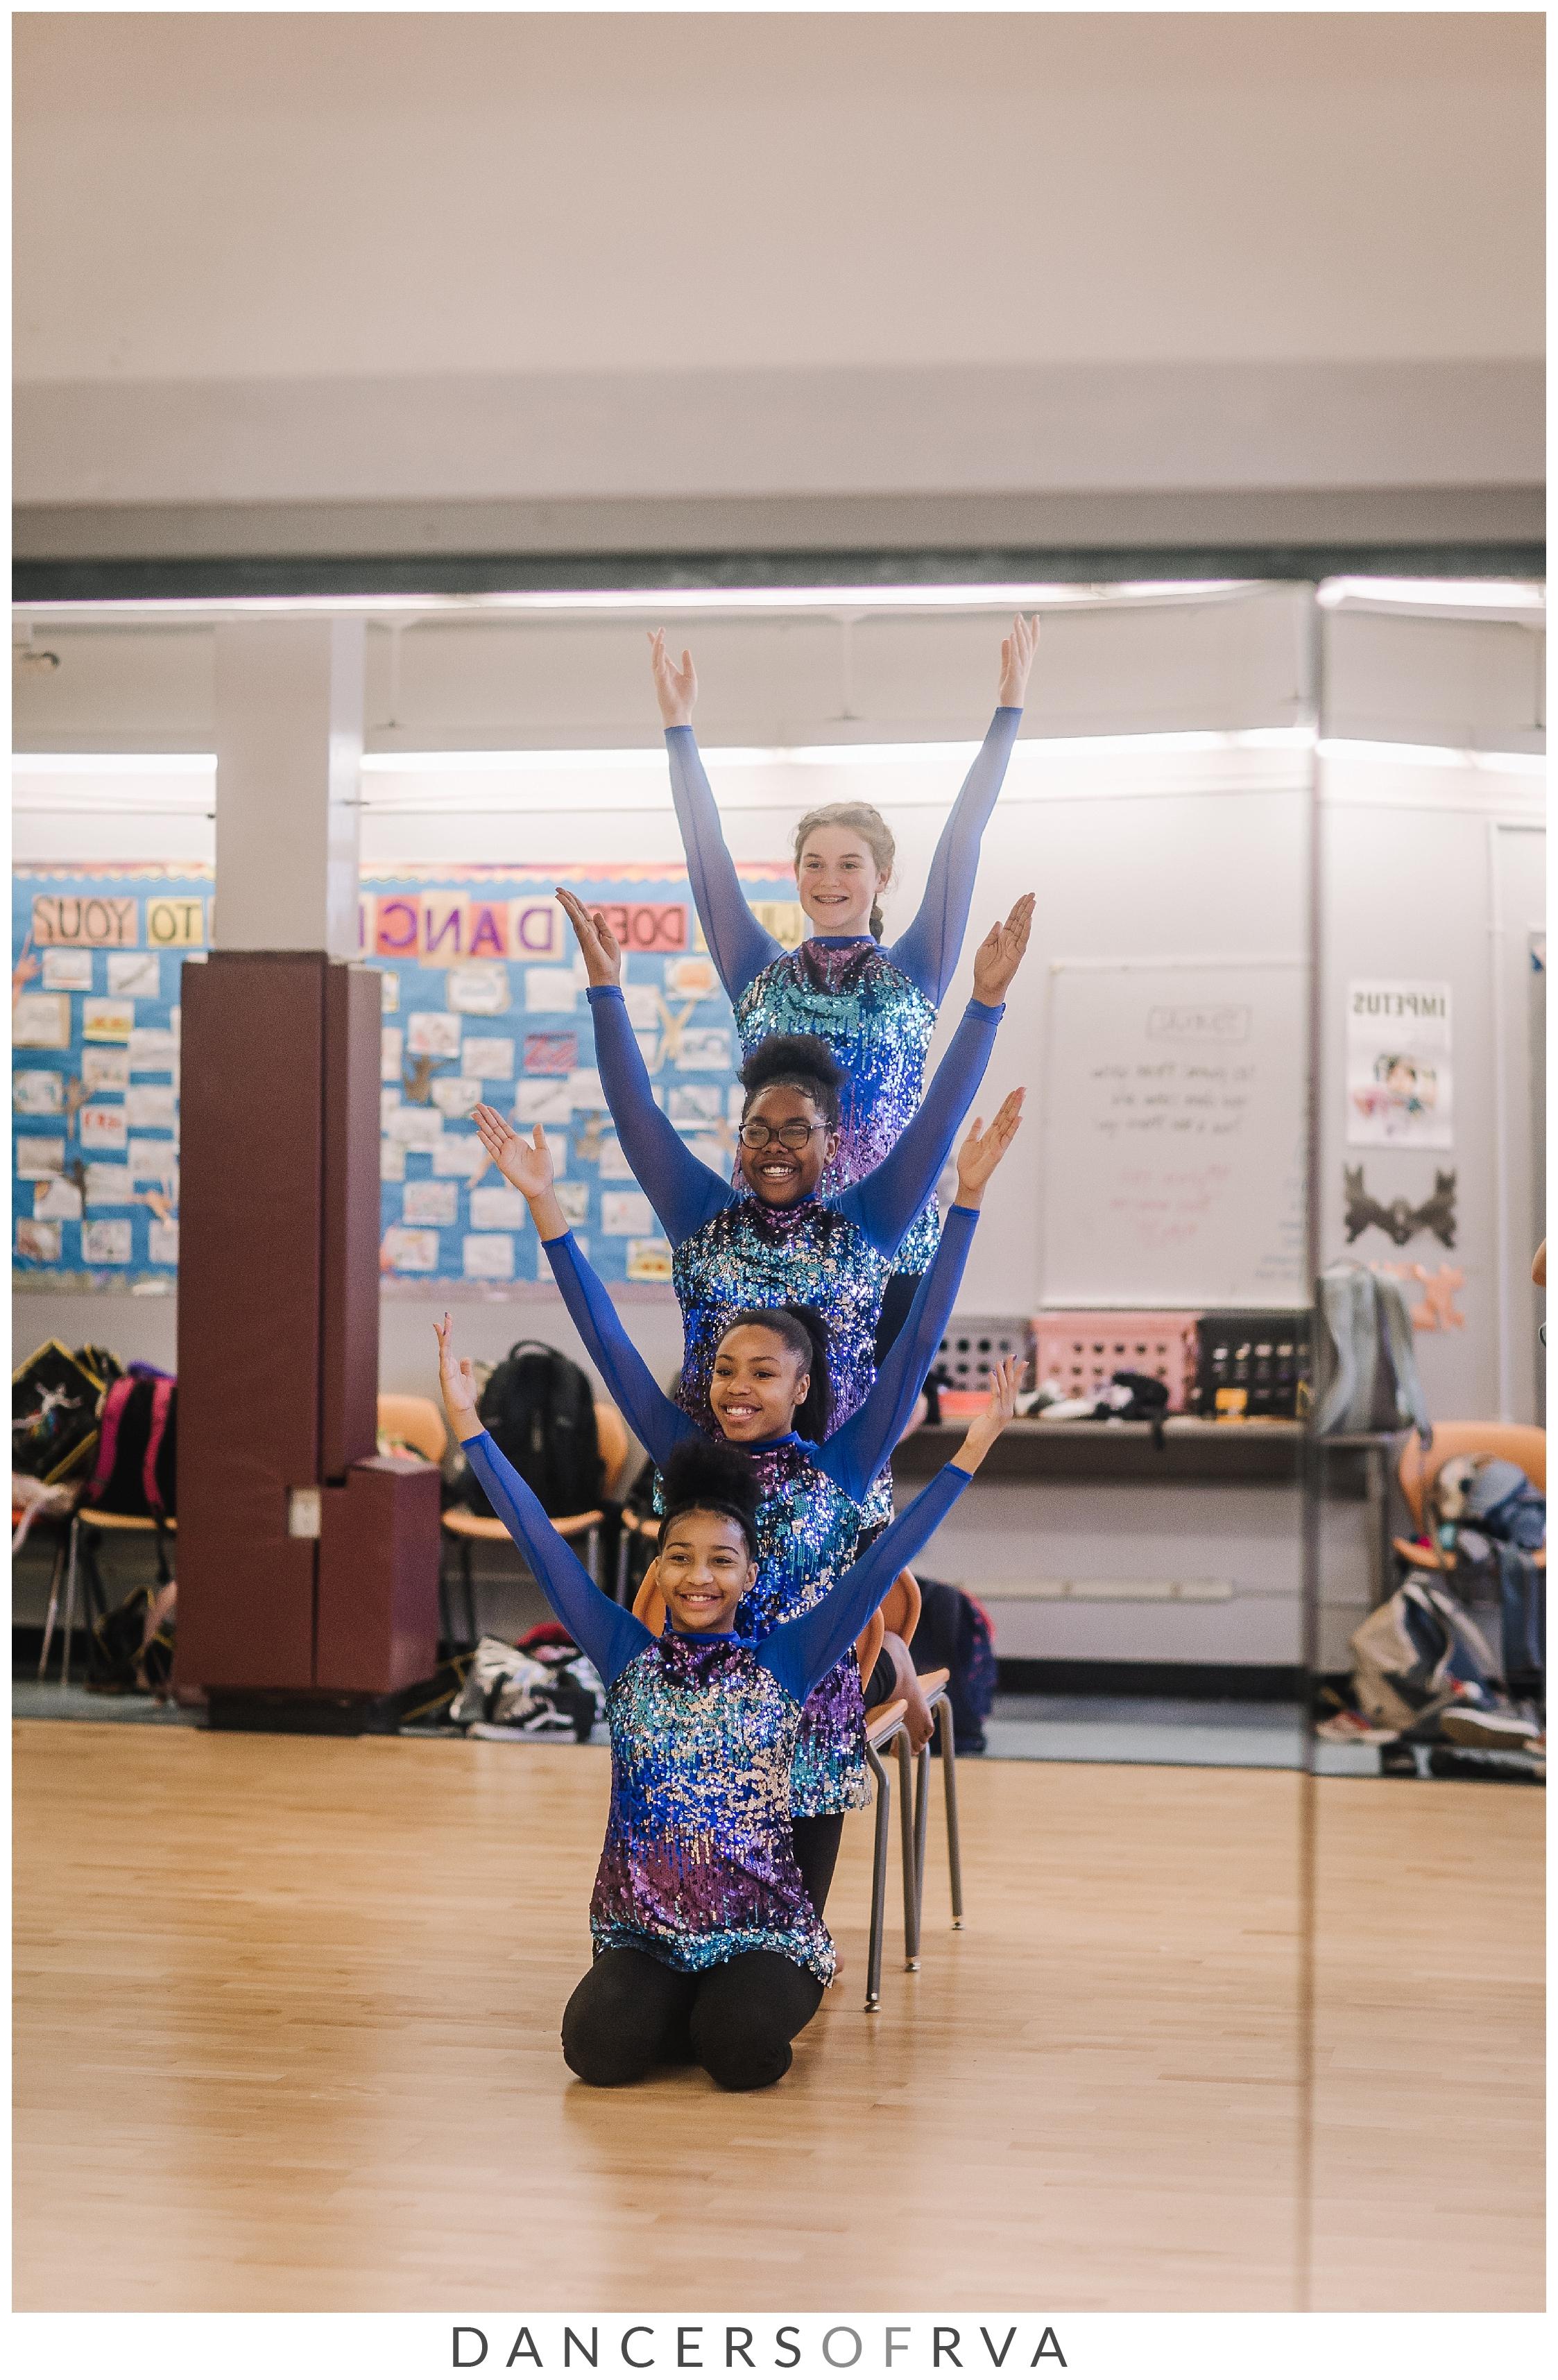 Richmond-Dance-Project-Binford-Dance-Company-Dancers-of-RVA_0008.jpg